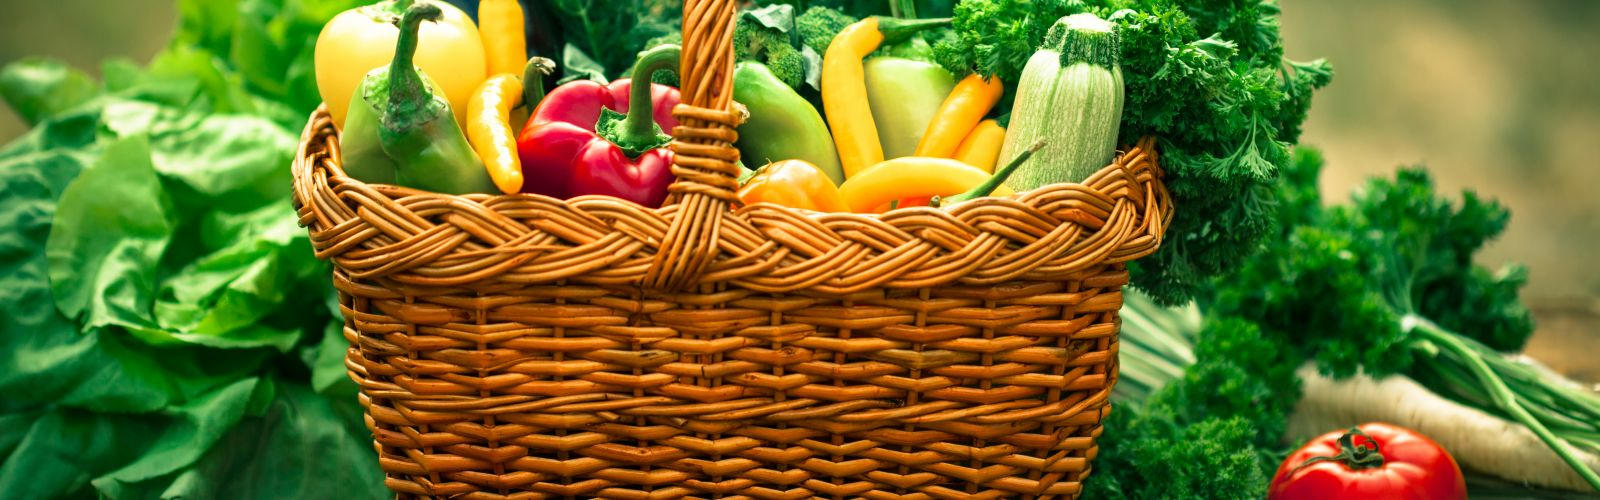 Garden veggies and herbs in a basket